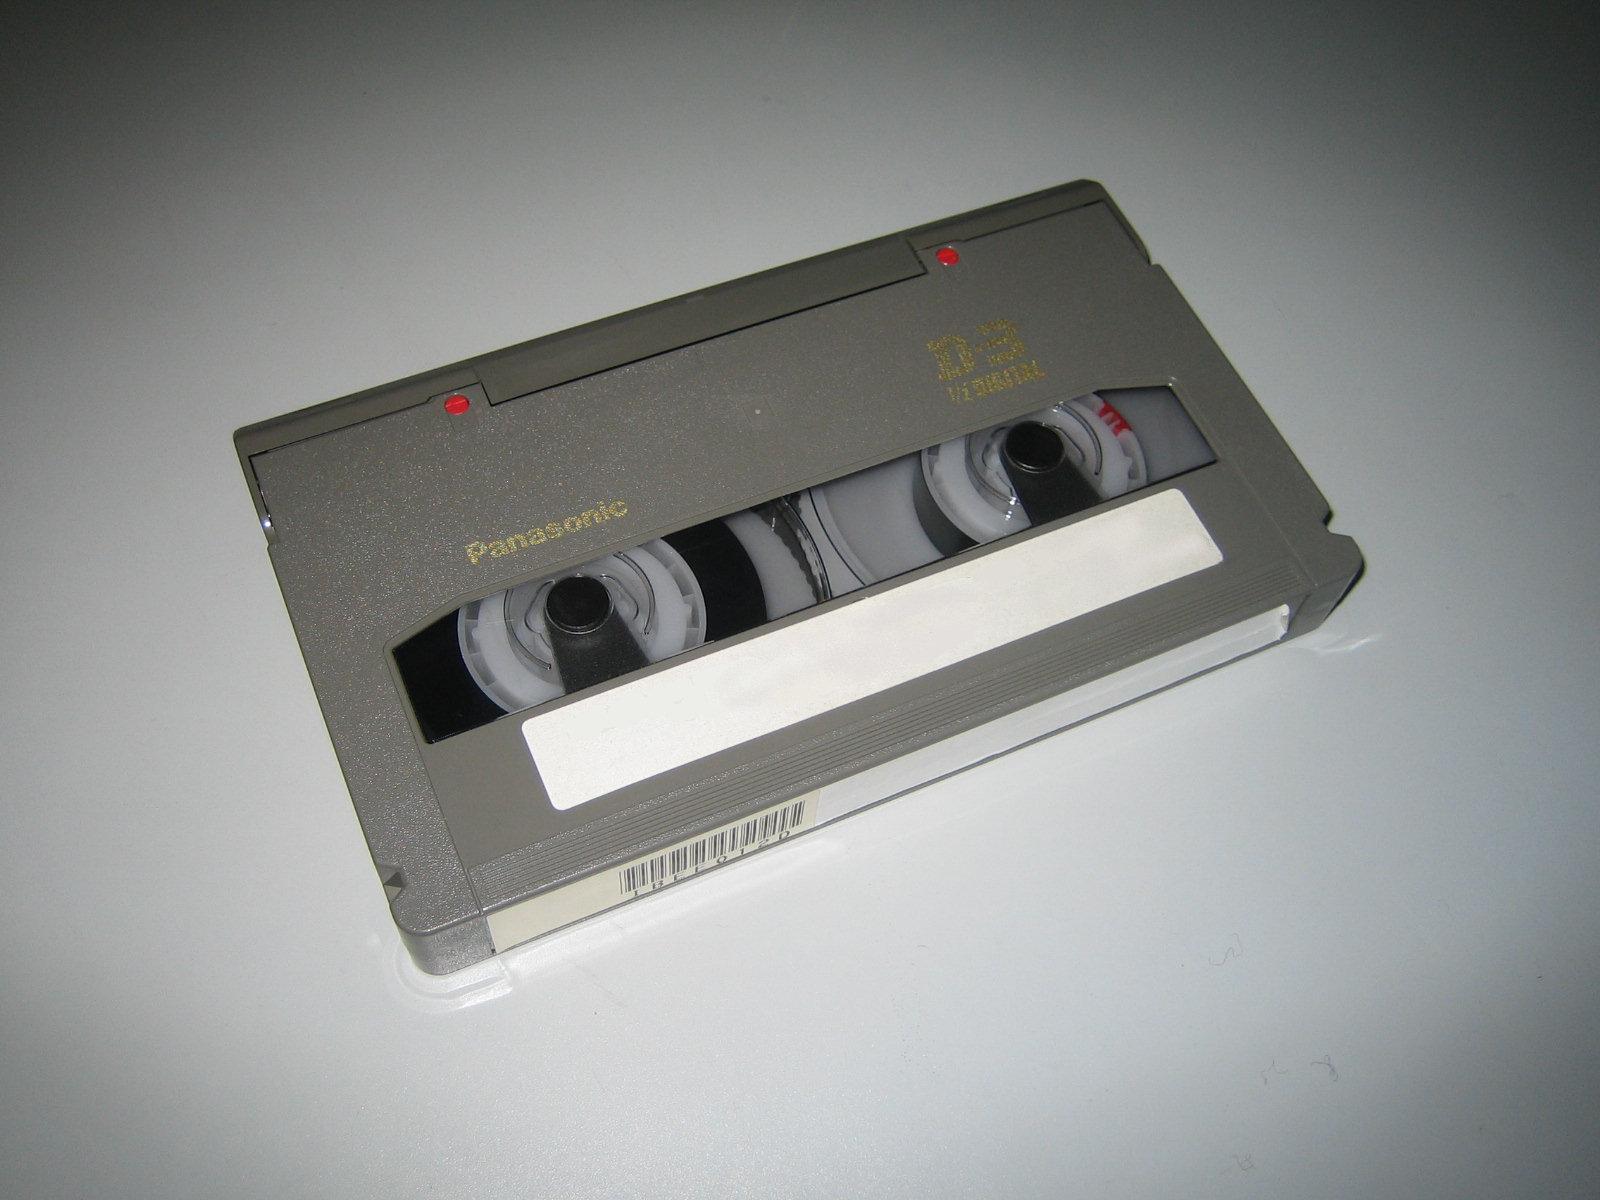 D3 Cassette